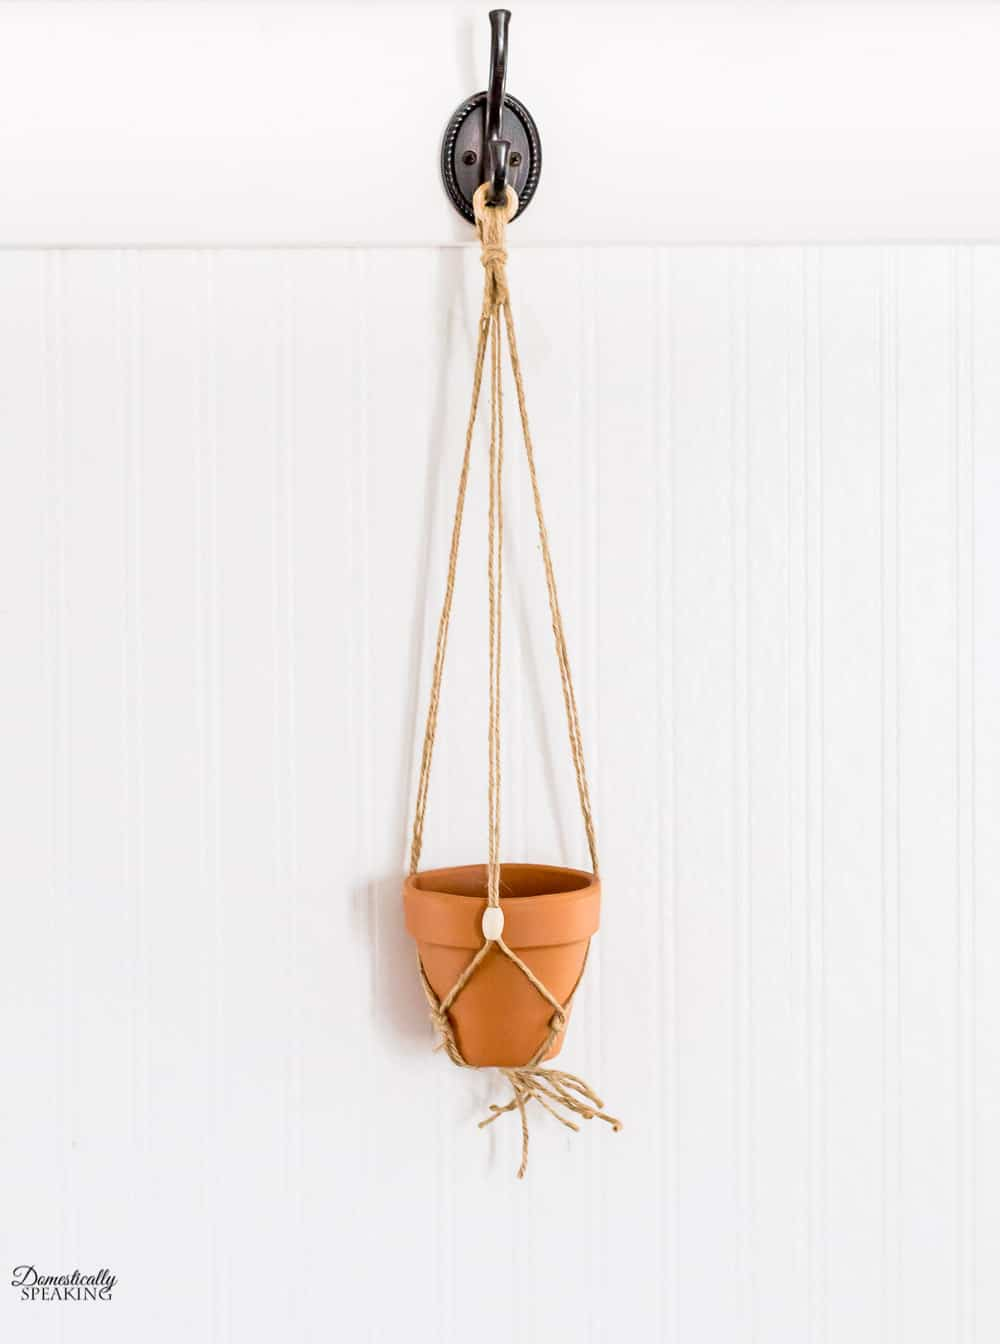 Add pot to macrame hanger